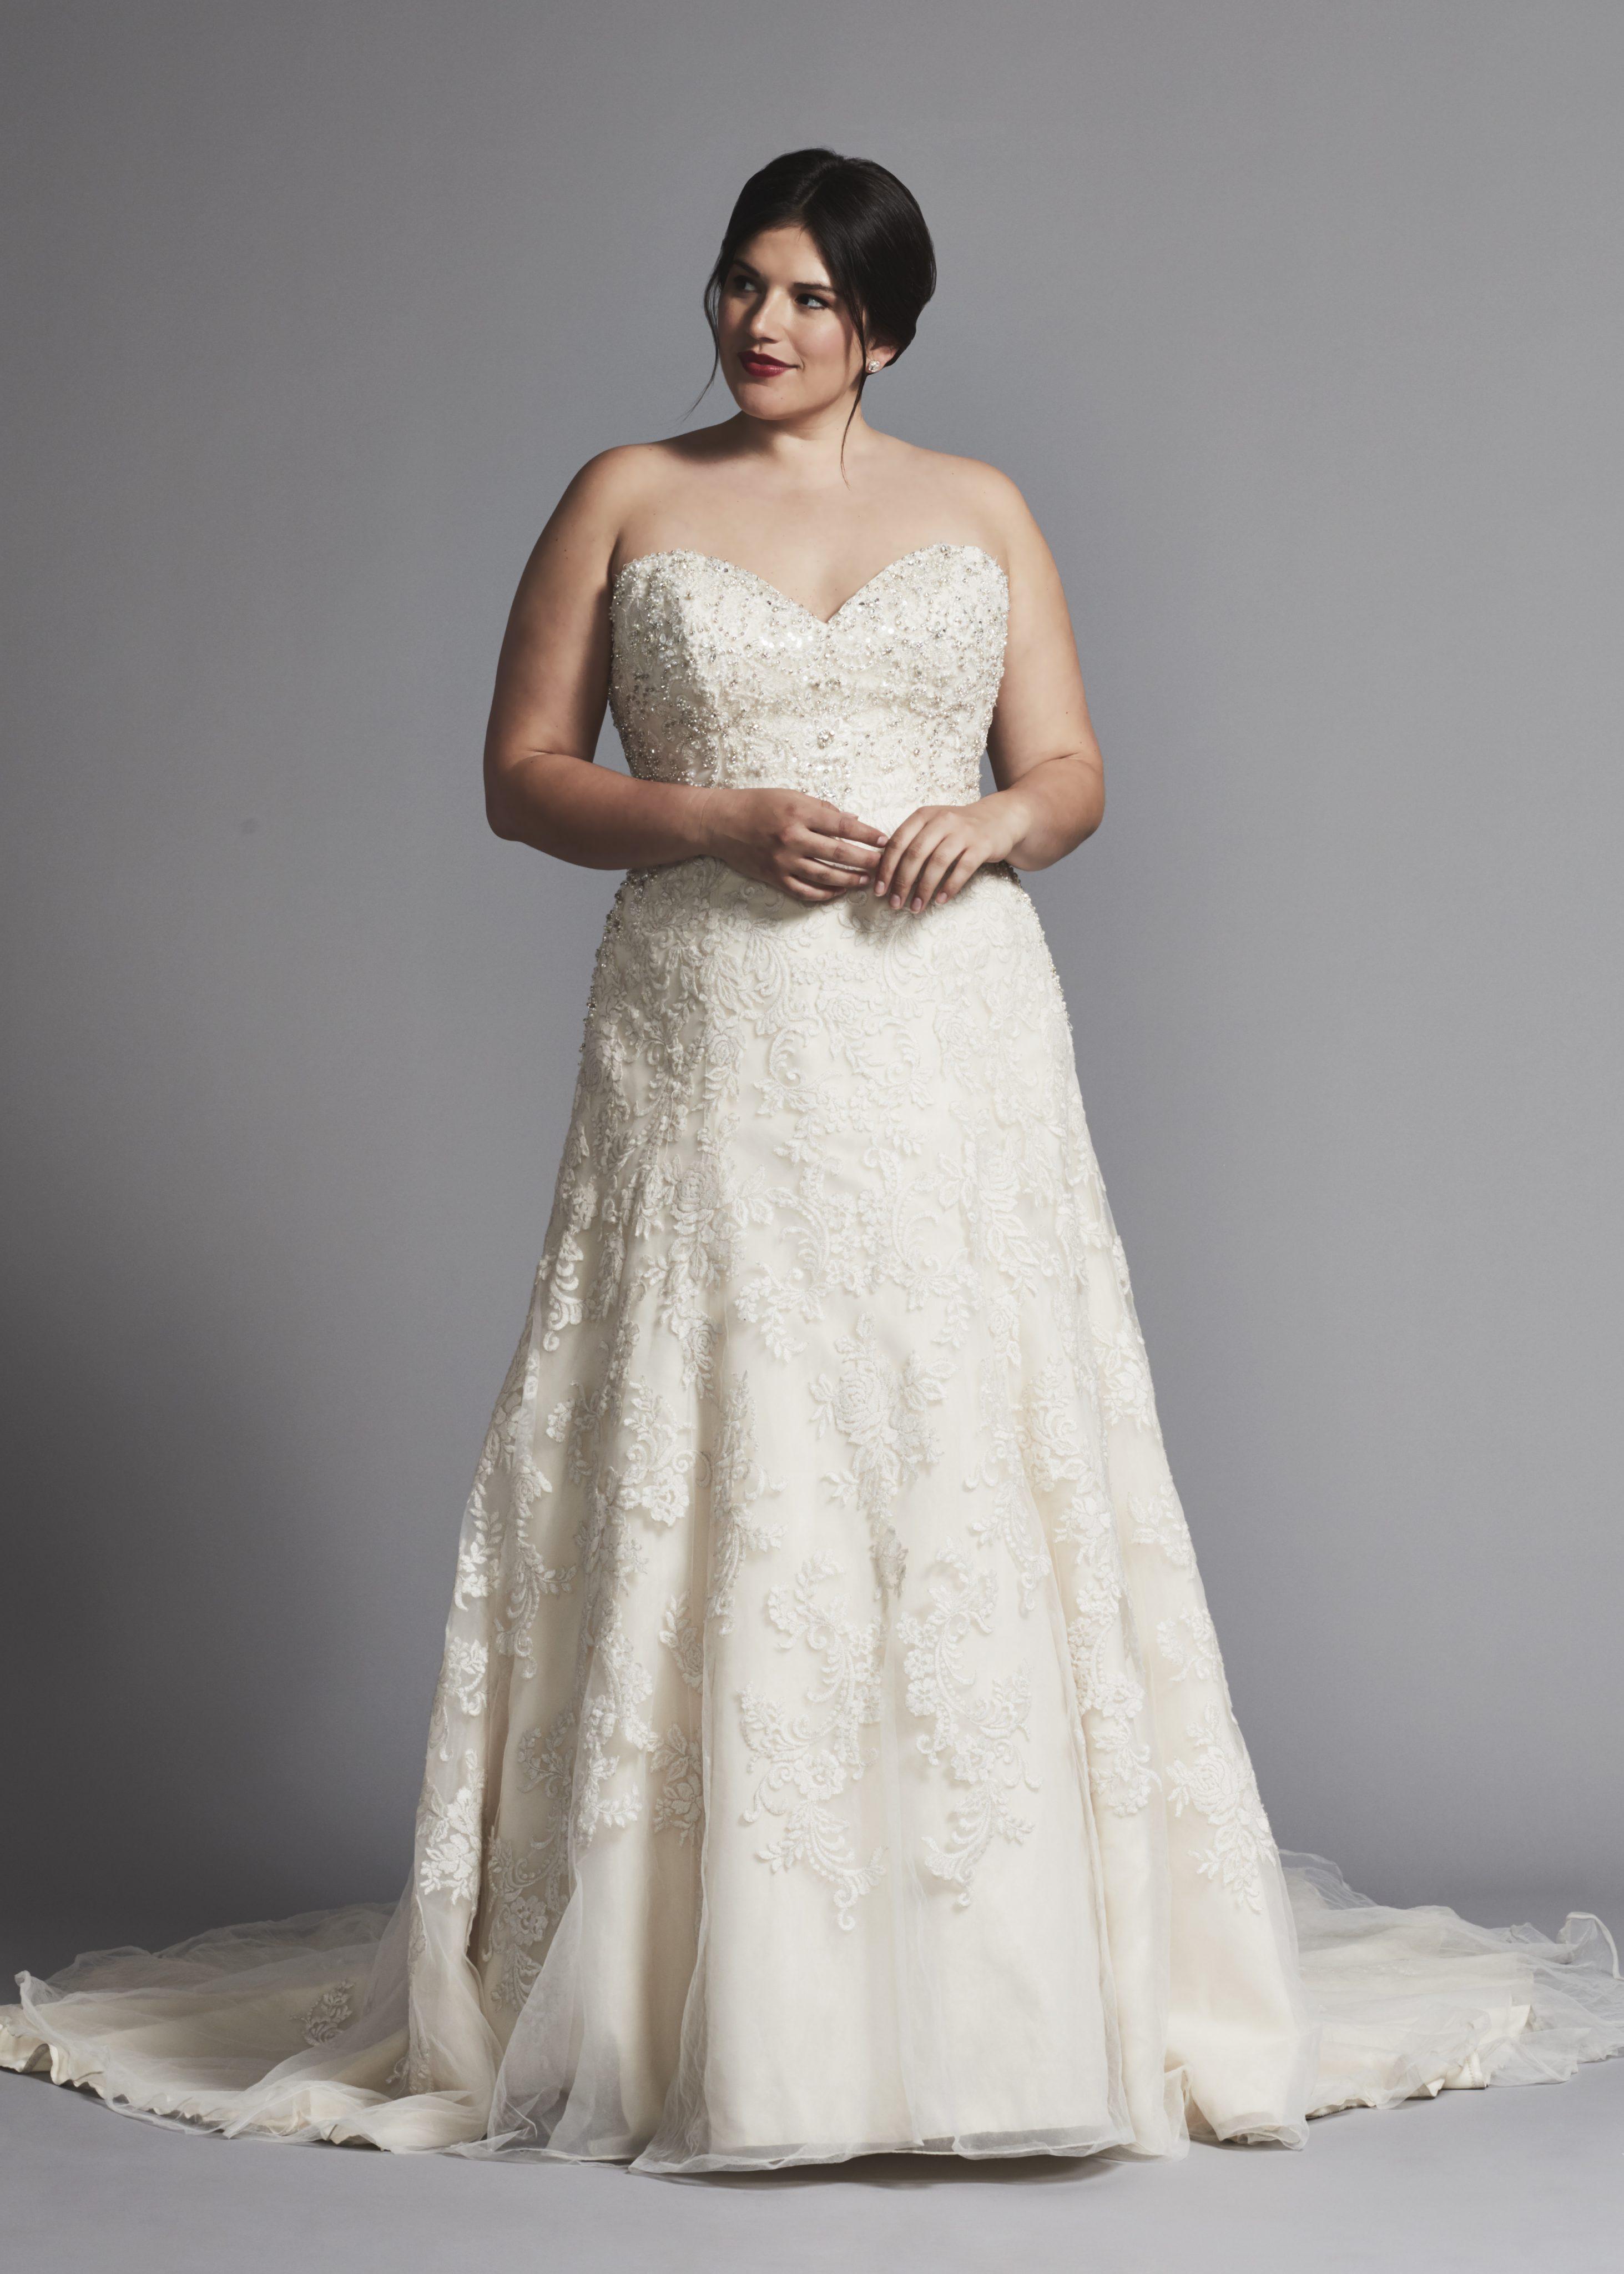 Strapless A-line Beaded Wedding Dress   Kleinfeld Bridal